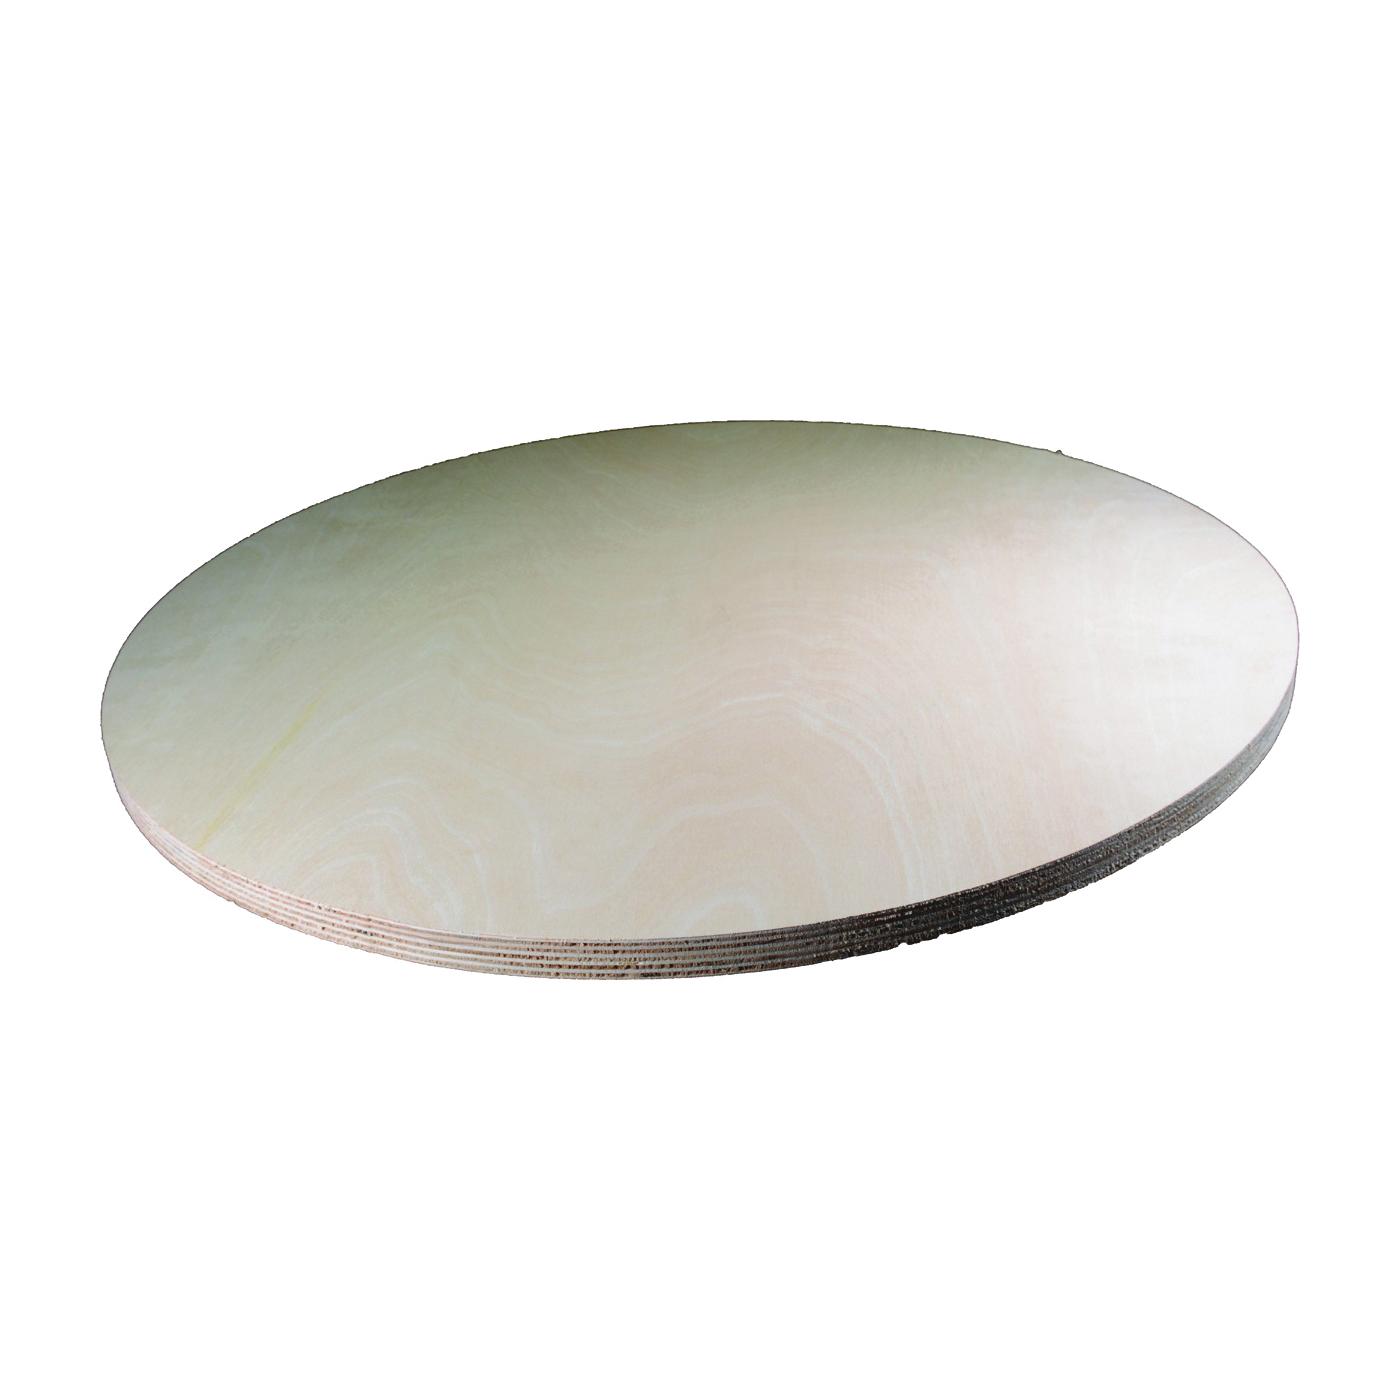 ALEXANDRIA Moulding PYR04-PY024C